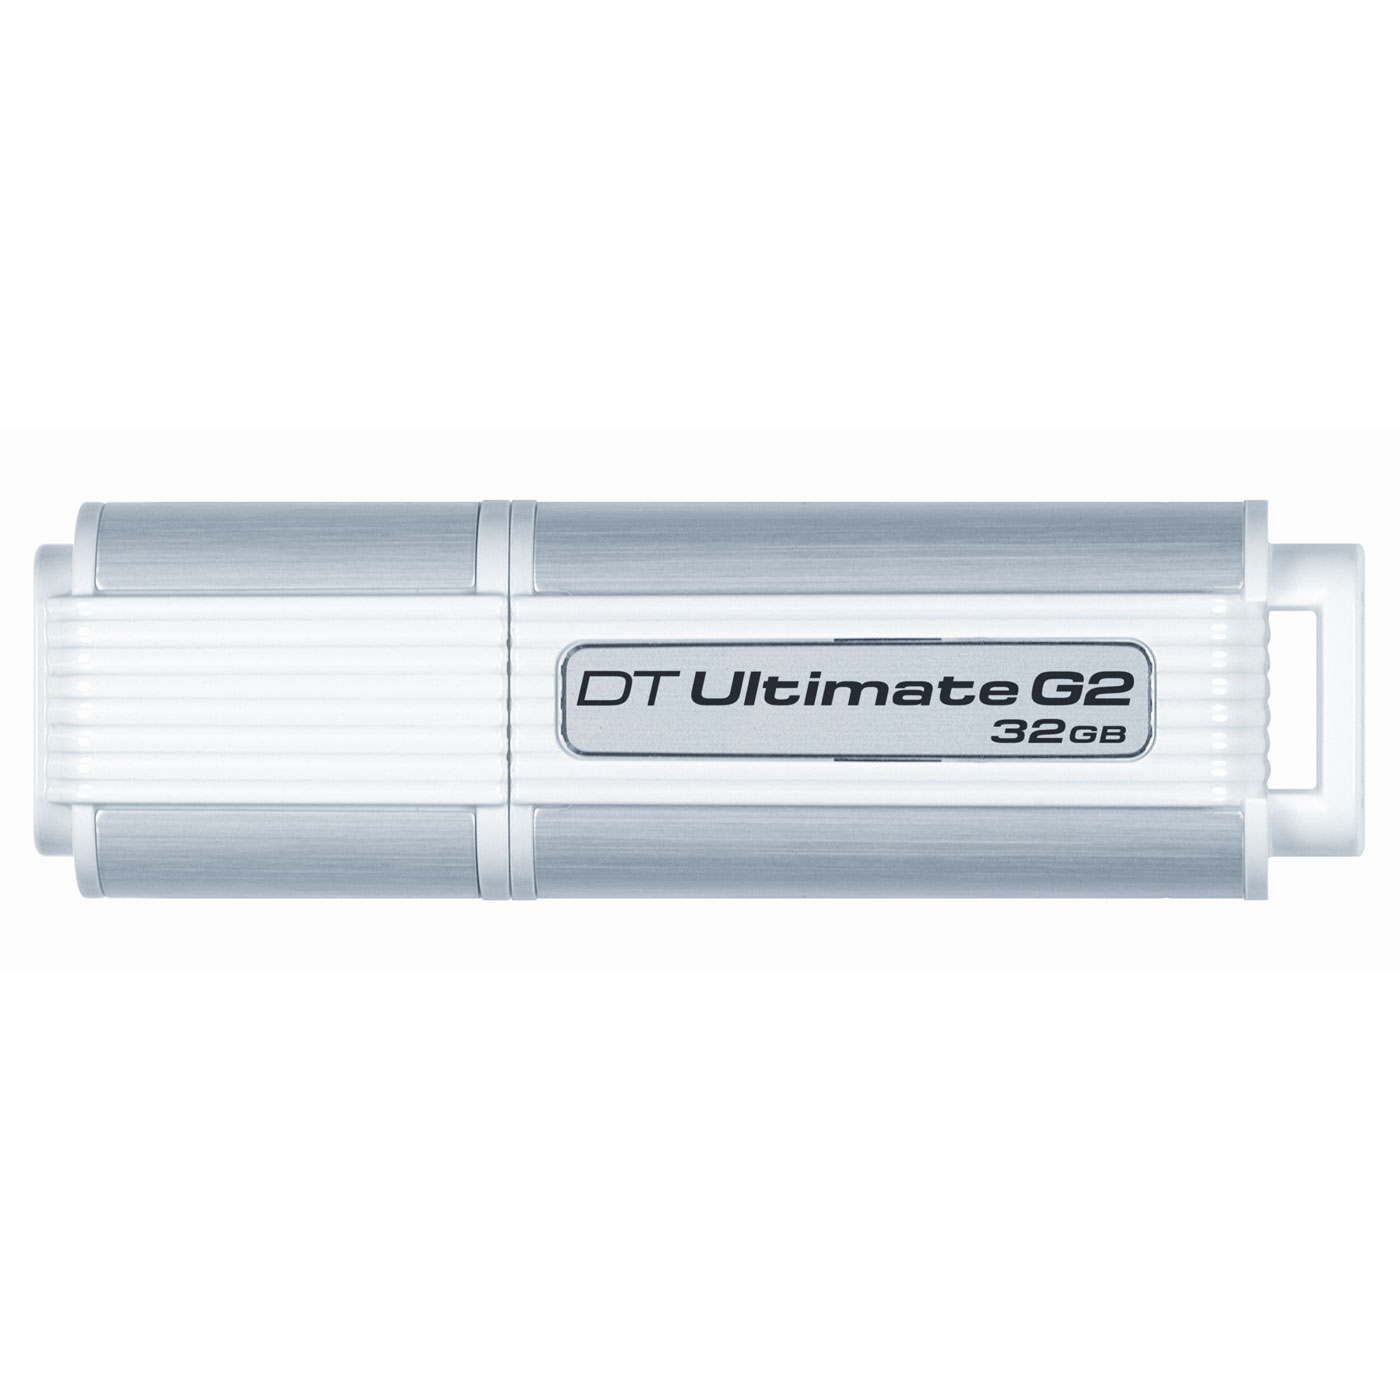 Clé USB Kingston DataTraveler Ultimate 3.0 G2 32 Go Kingston DataTraveler Ultimate 3.0 G2 32 Go - USB 3.0 (garantie constructeur 5 ans)